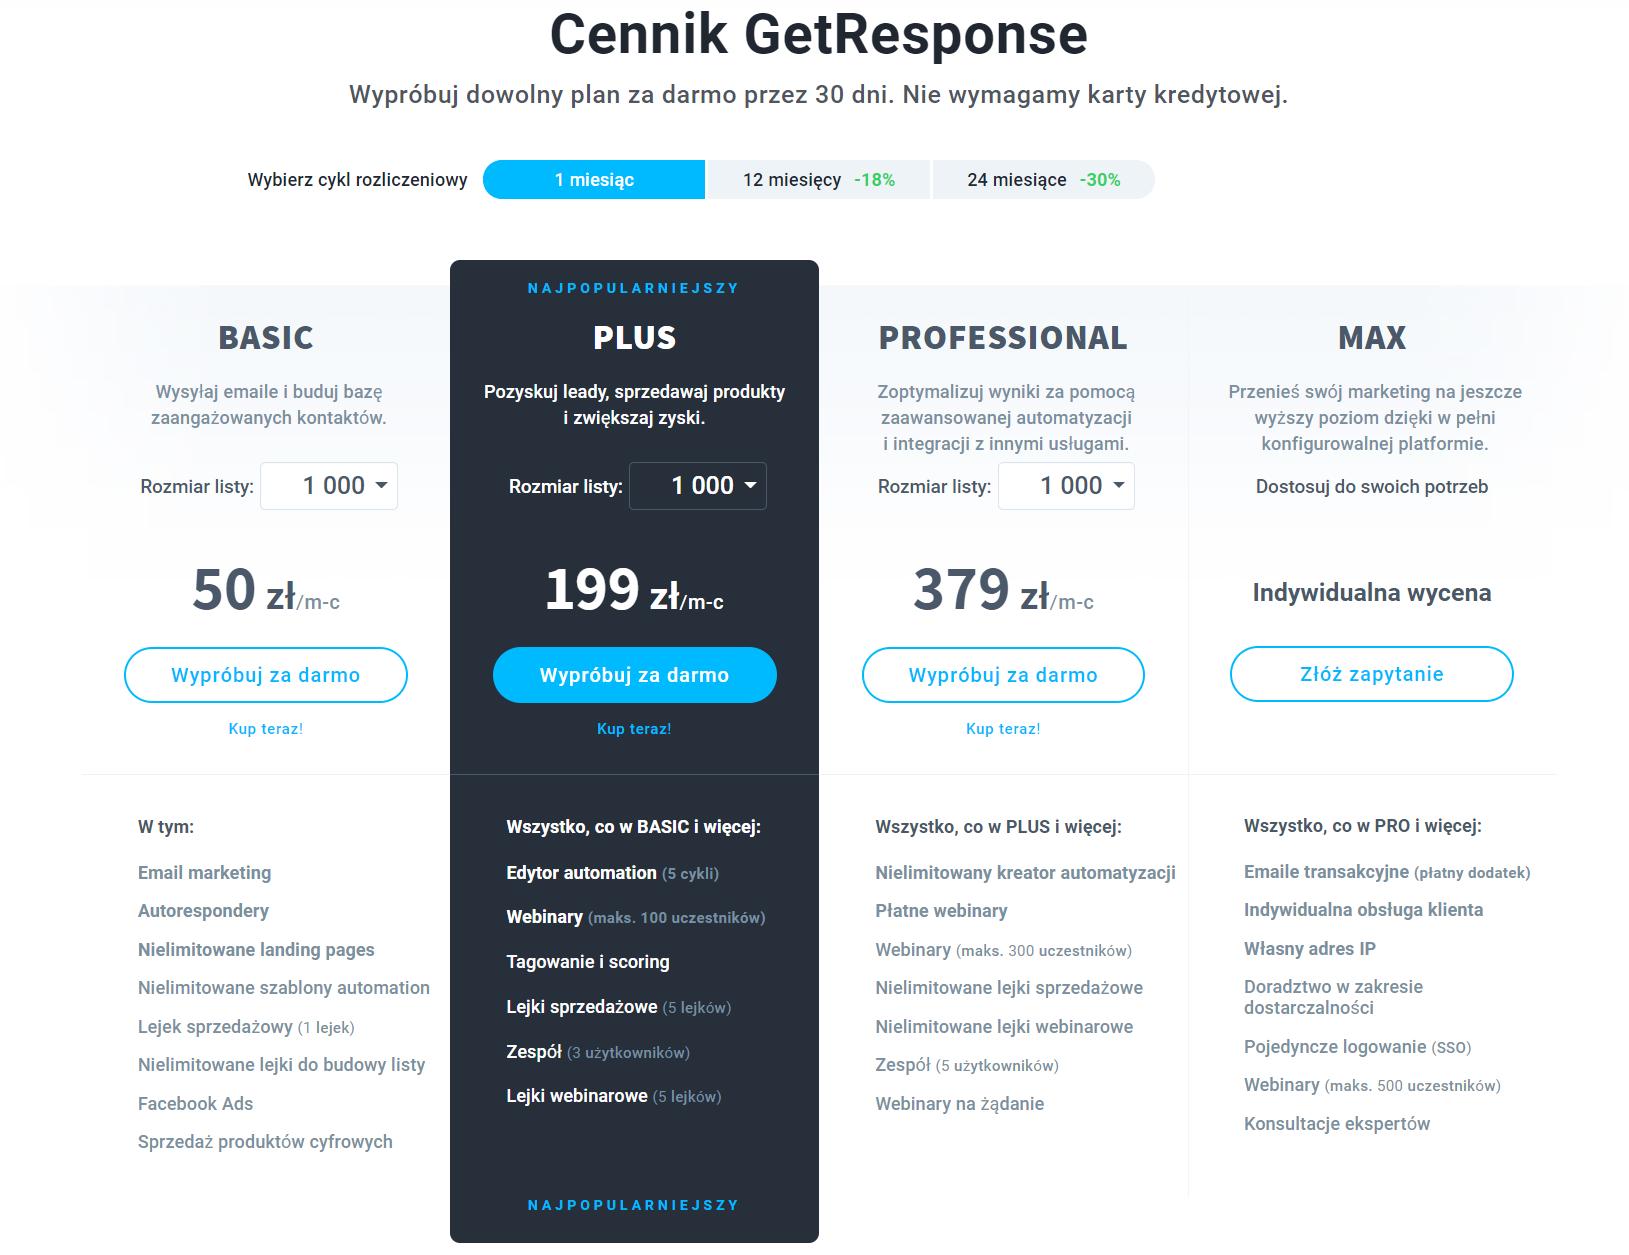 GetResponse cennik